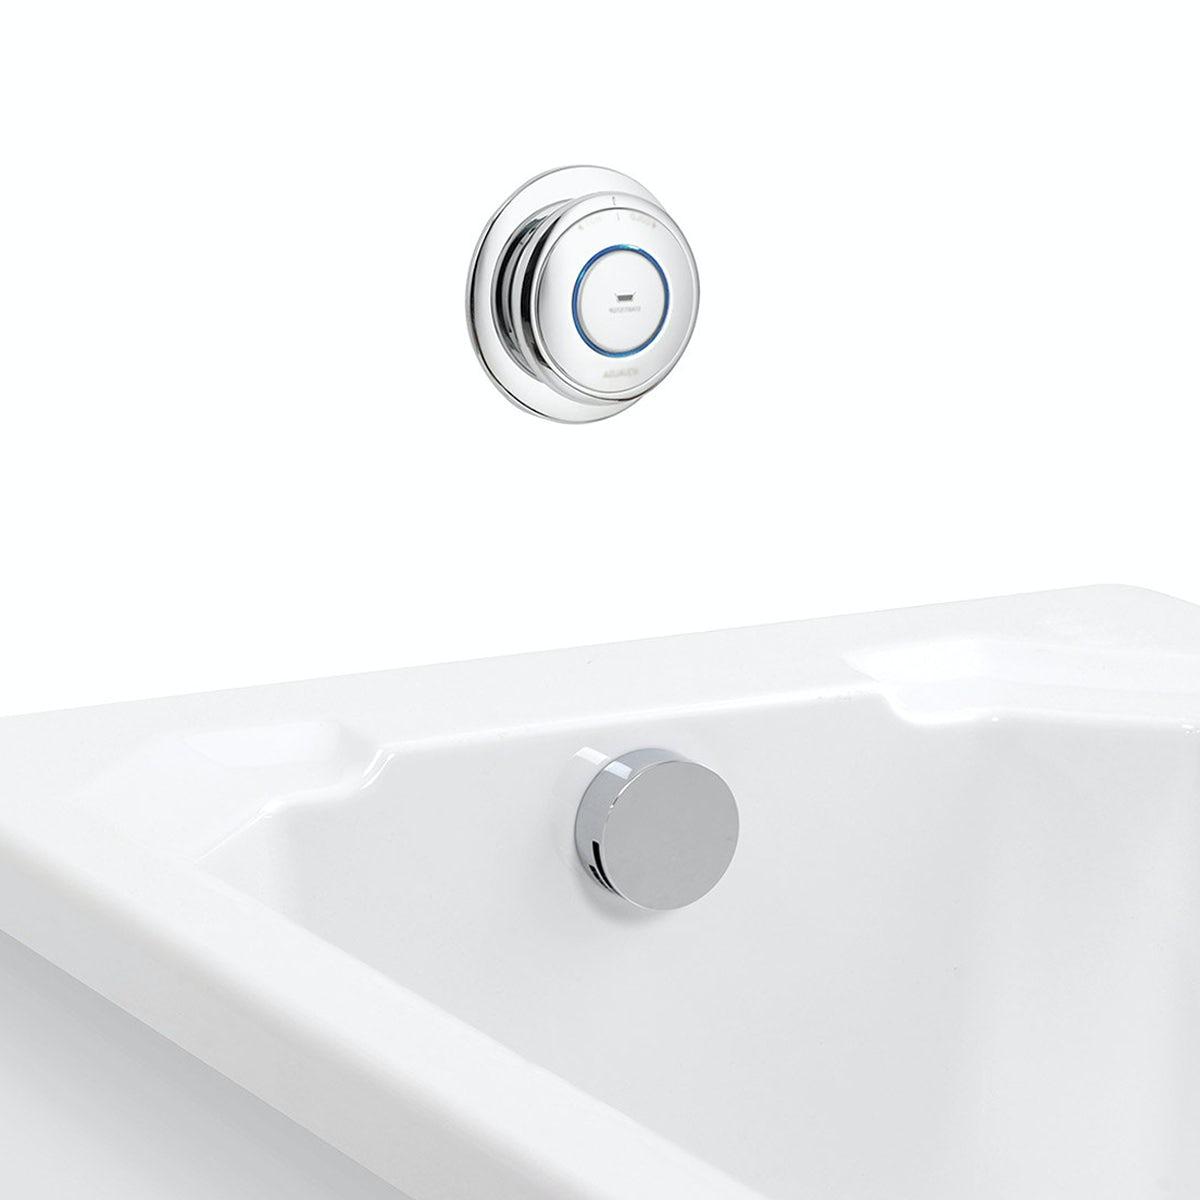 Aqualisa quartz digital bath fill system standard - Sold by Victoria Plum